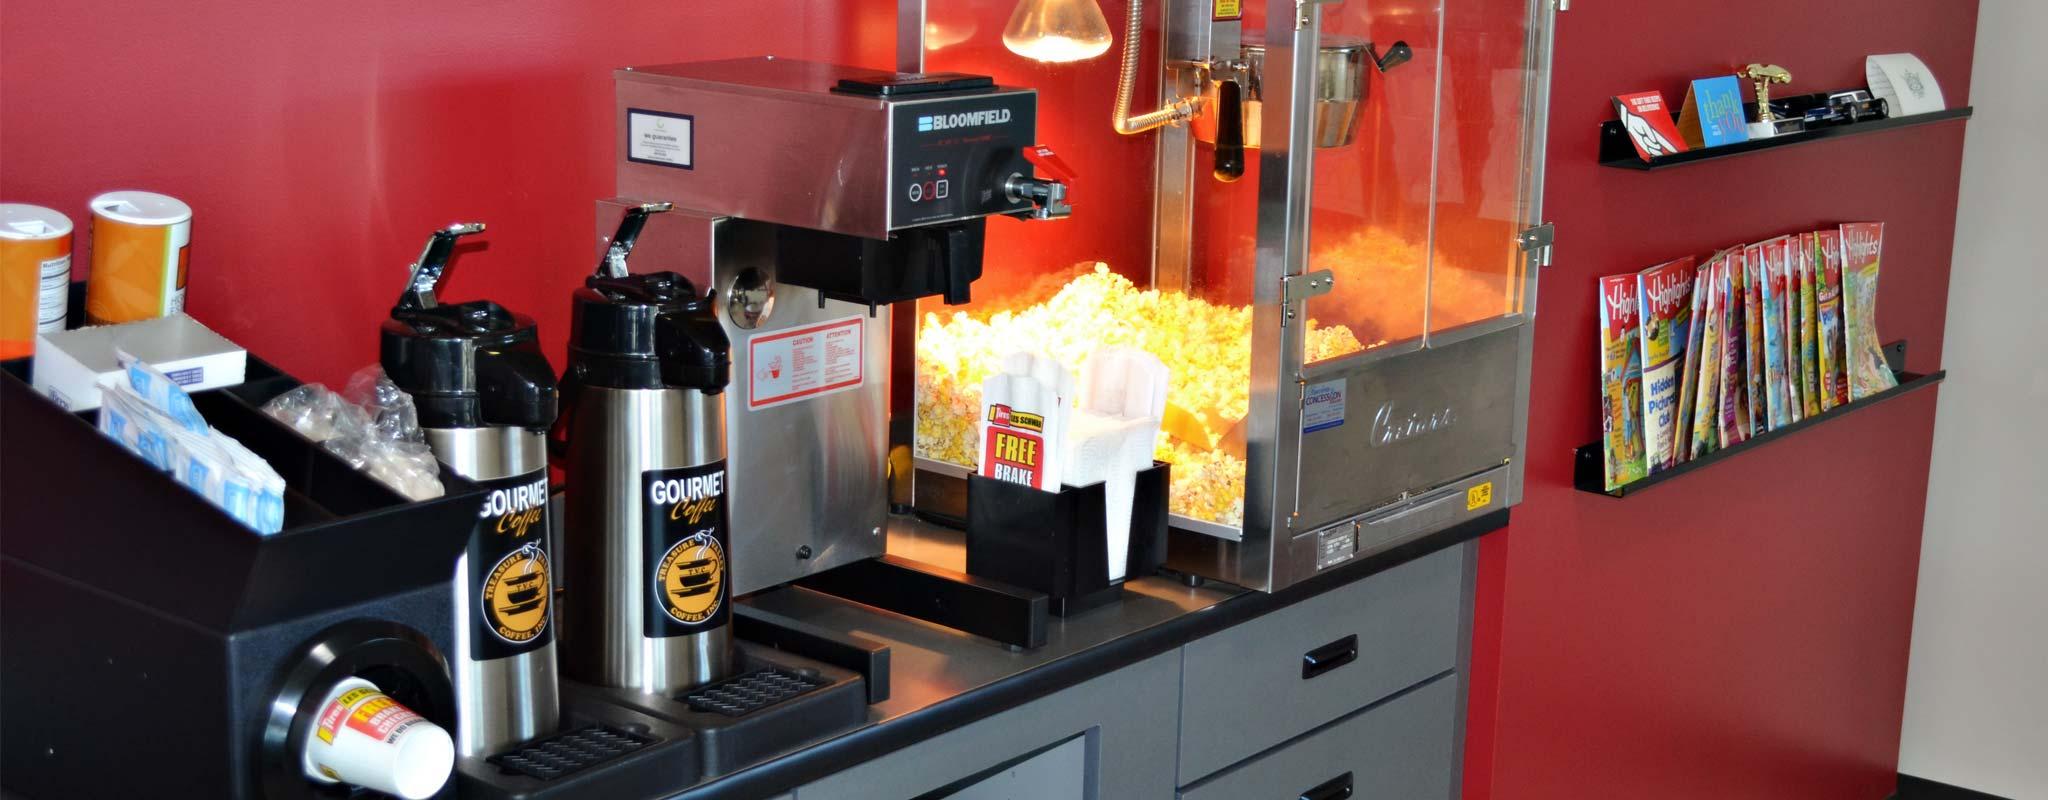 One of many Les Schwab's signature popcorn machines.